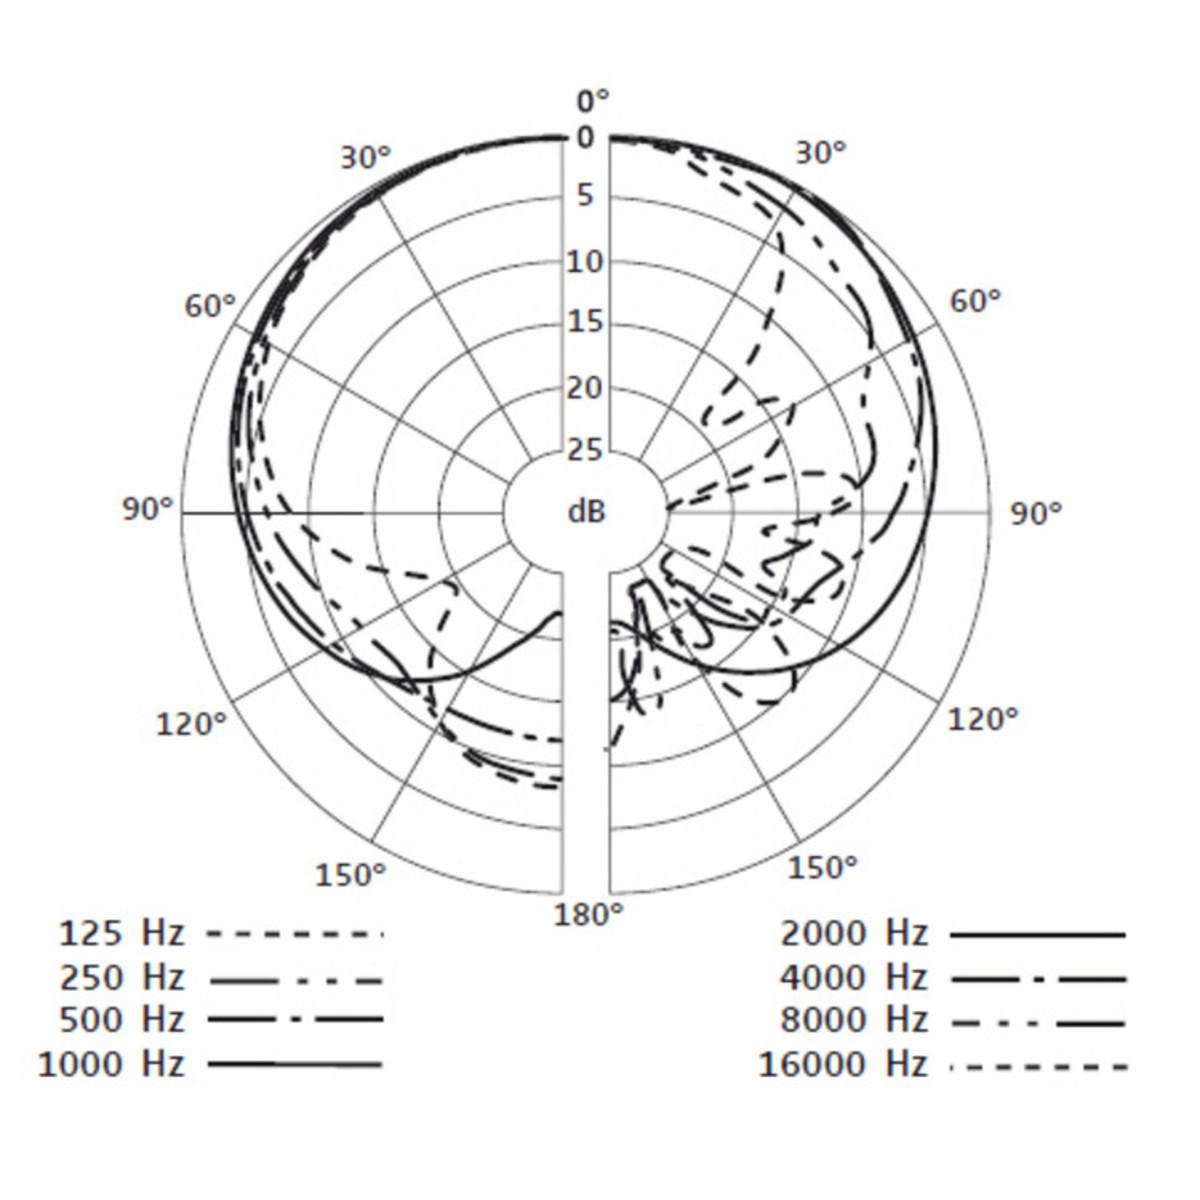 Sennheiser E904 Dynamic Cardioid Tom Microphone At Gear4music Wiring Diagram Loading Zoom